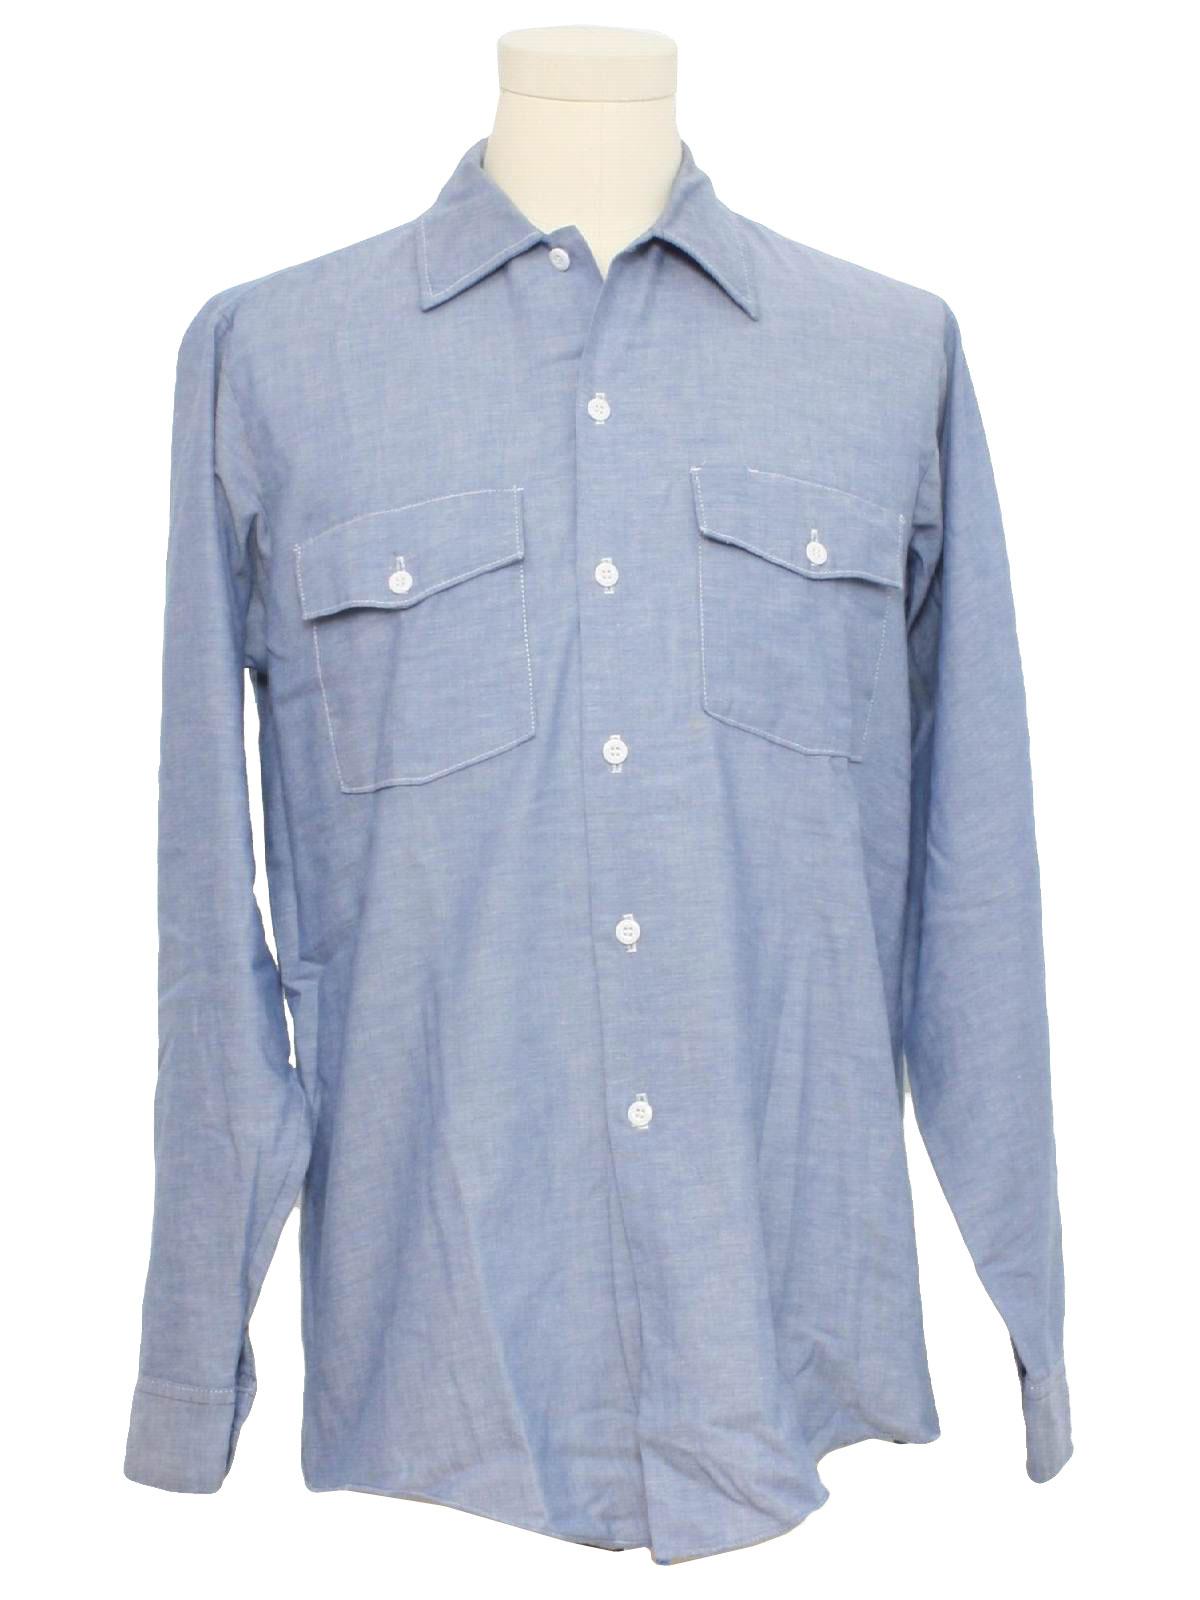 70s retro shirt 70s dickies mens light blue cotton and for Light blue work shirt